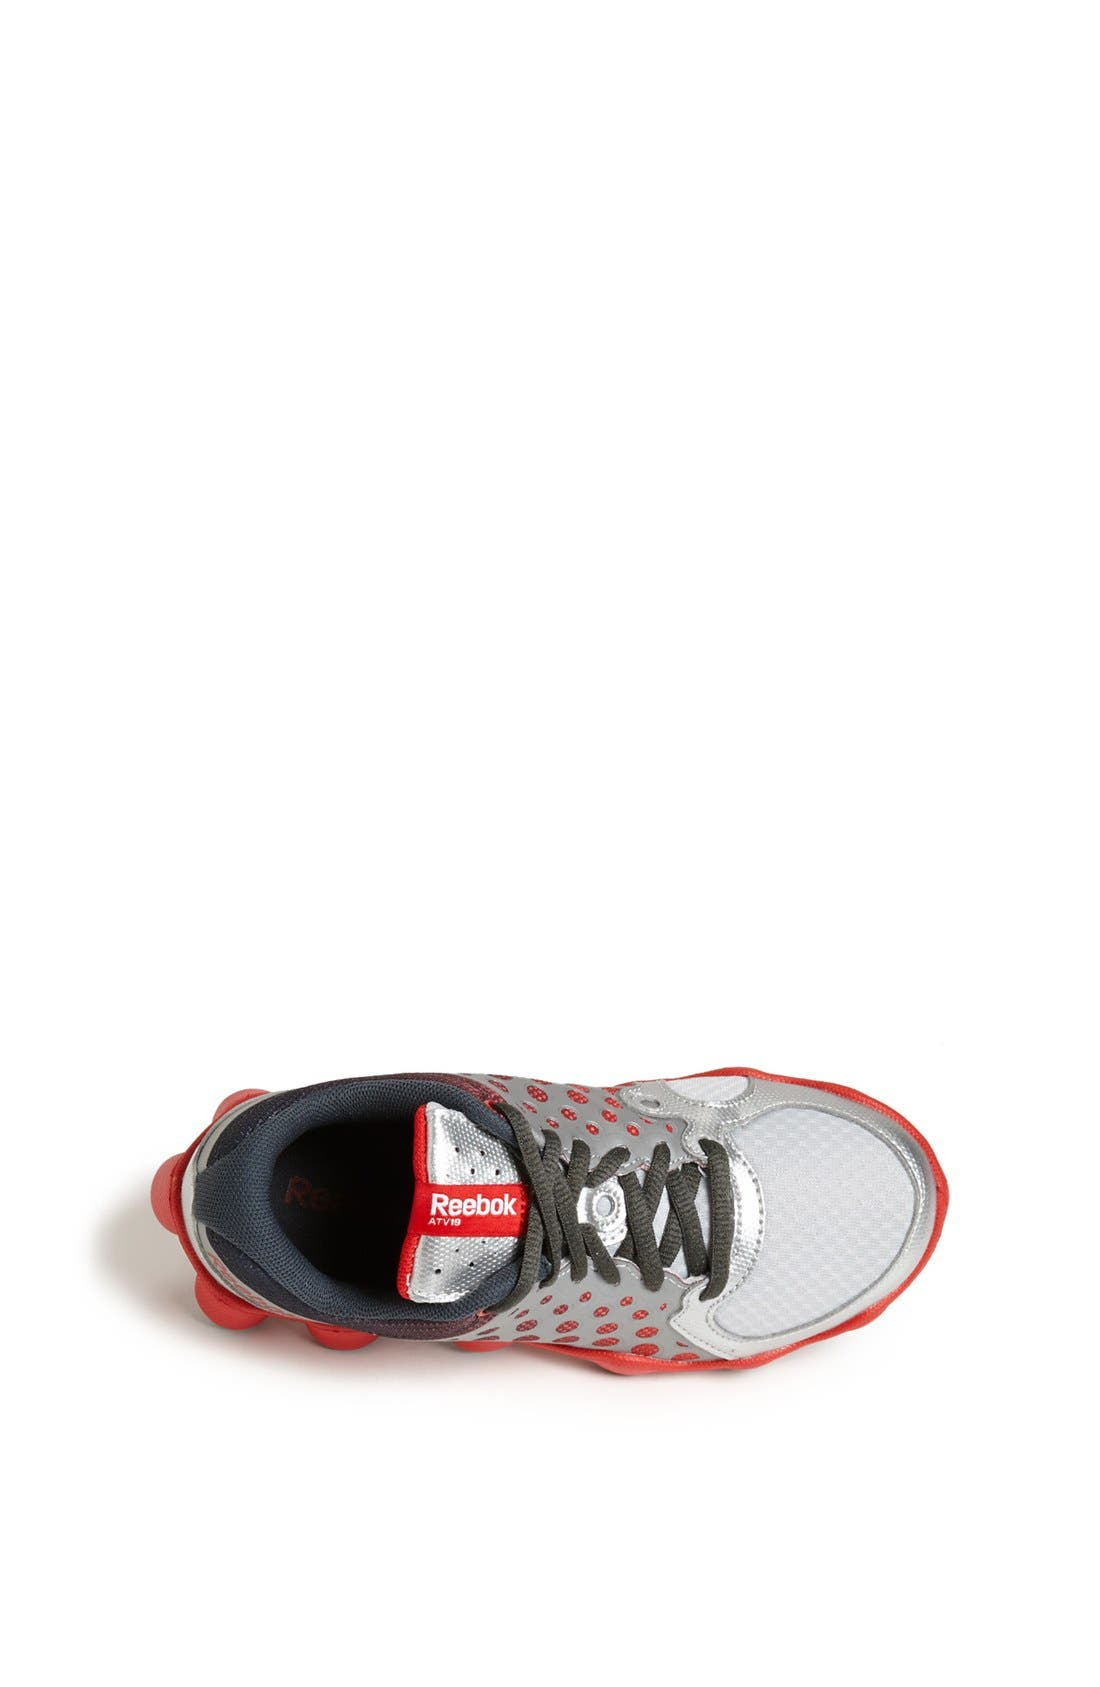 Alternate Image 3  - Reebok 'ATV19' Sneaker (Toddler, Little Kid & Big Kid)